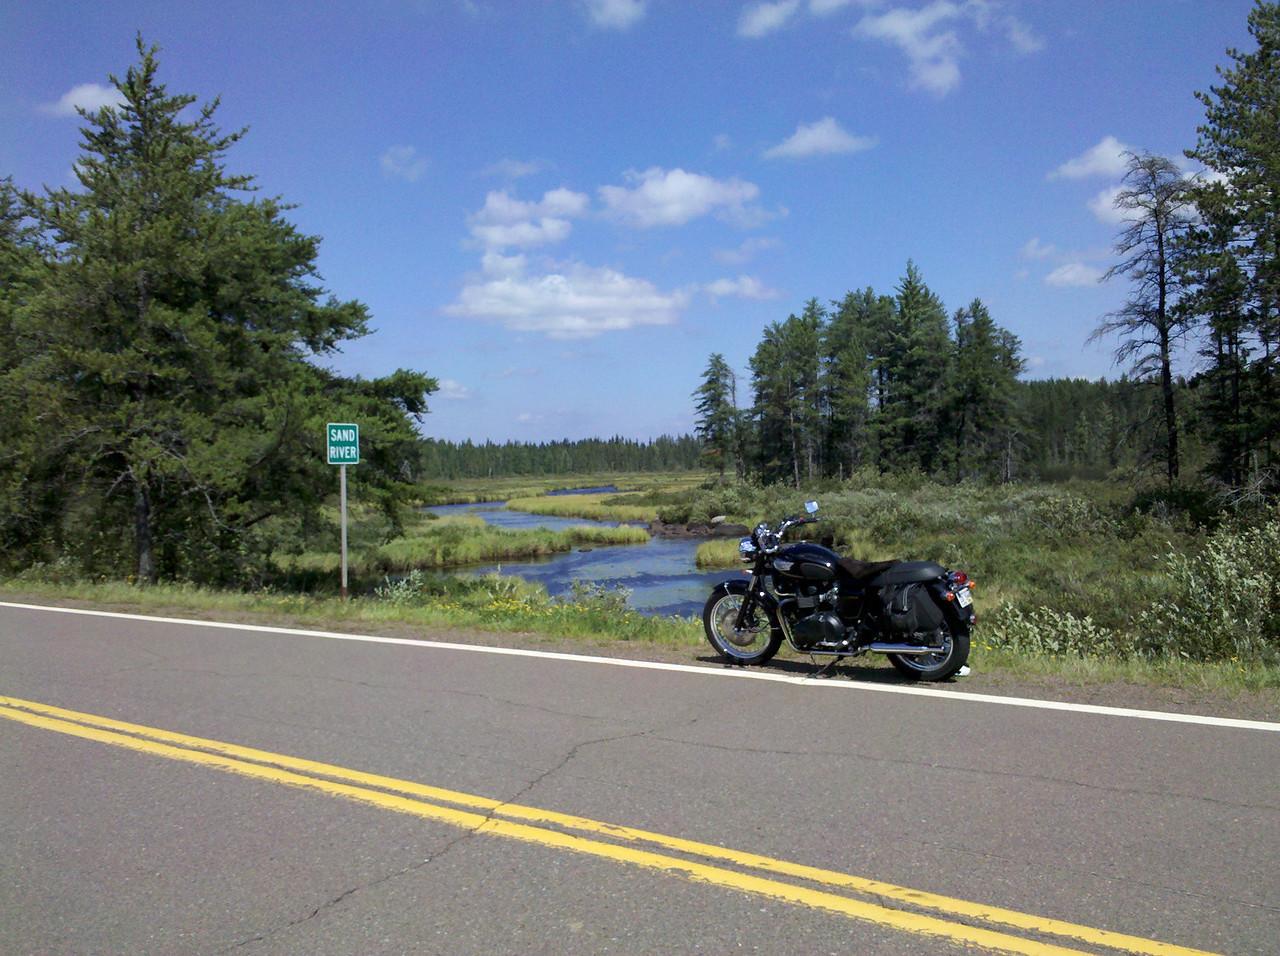 Sand River on Highway 2, Superior National Forest